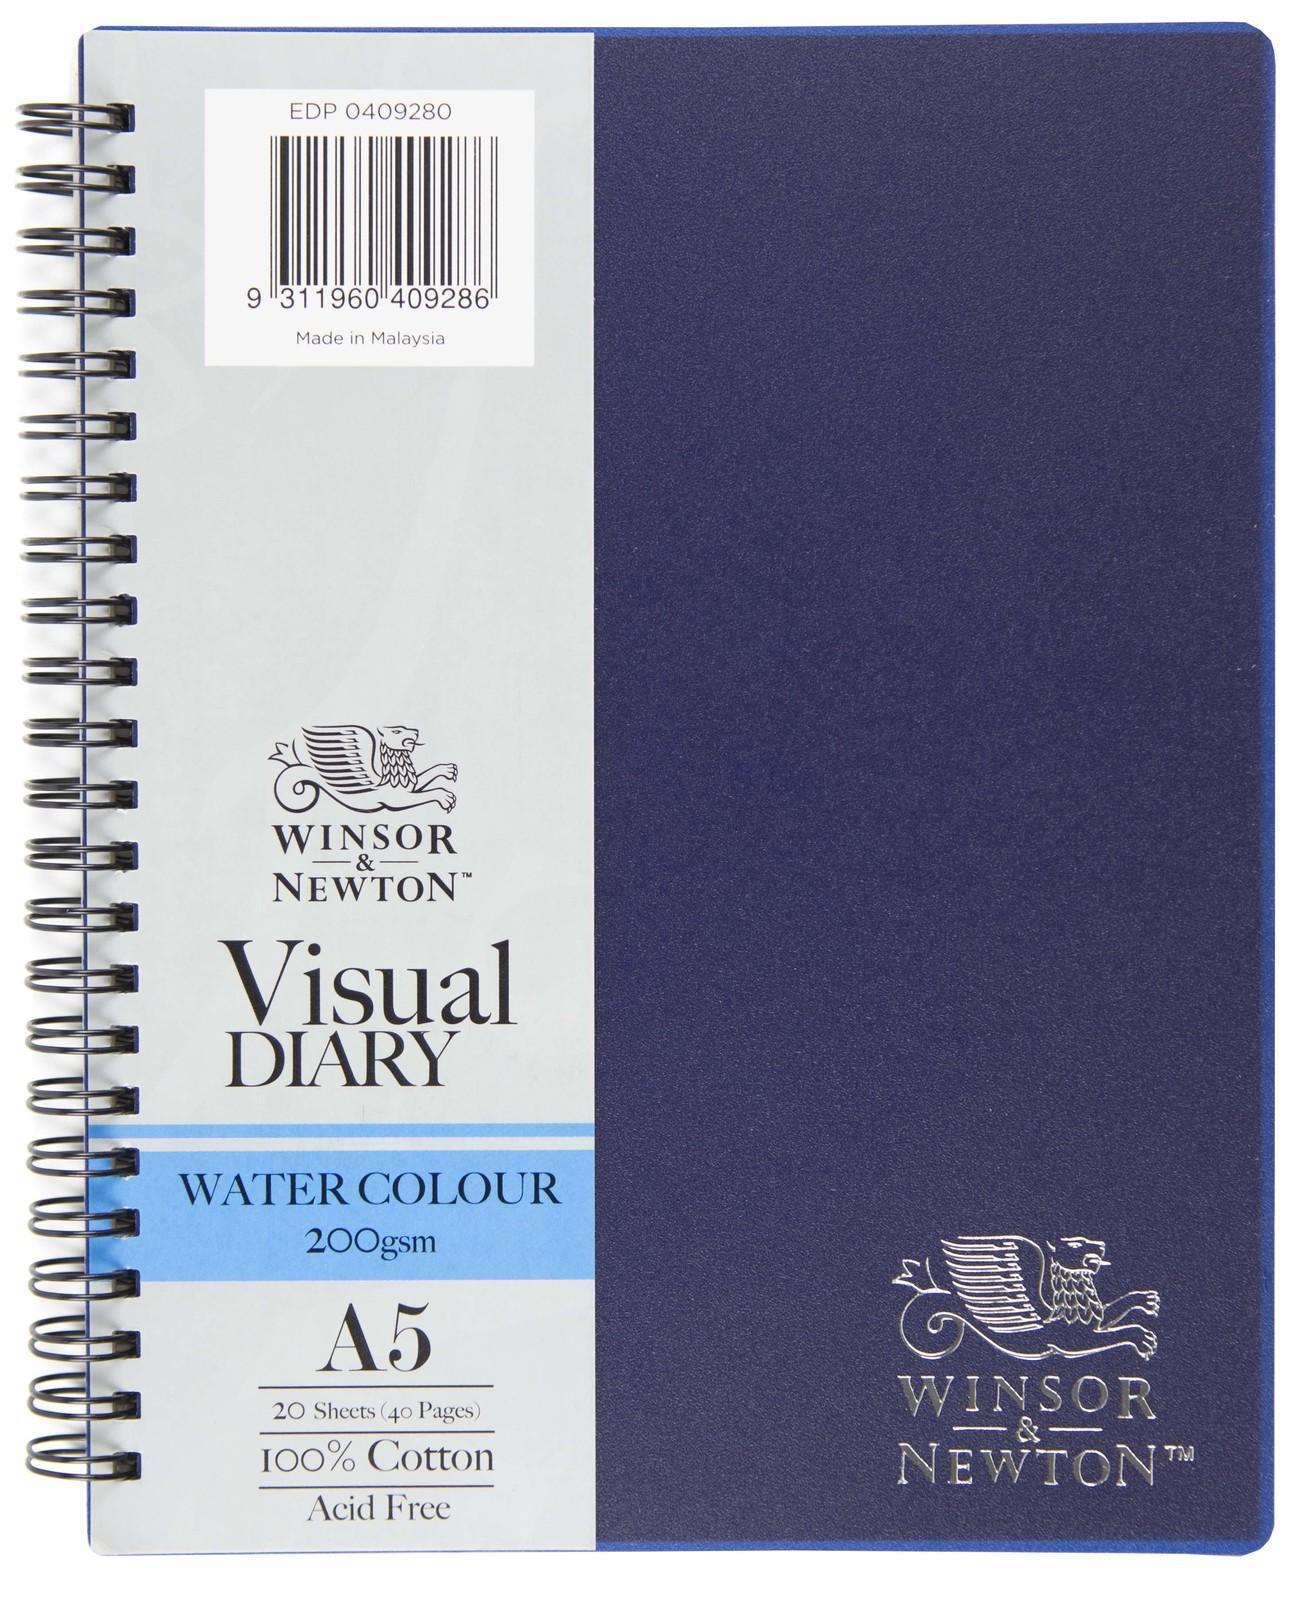 Winsor & Newton Watercolour Diary 200gsm Wiro (A5) image